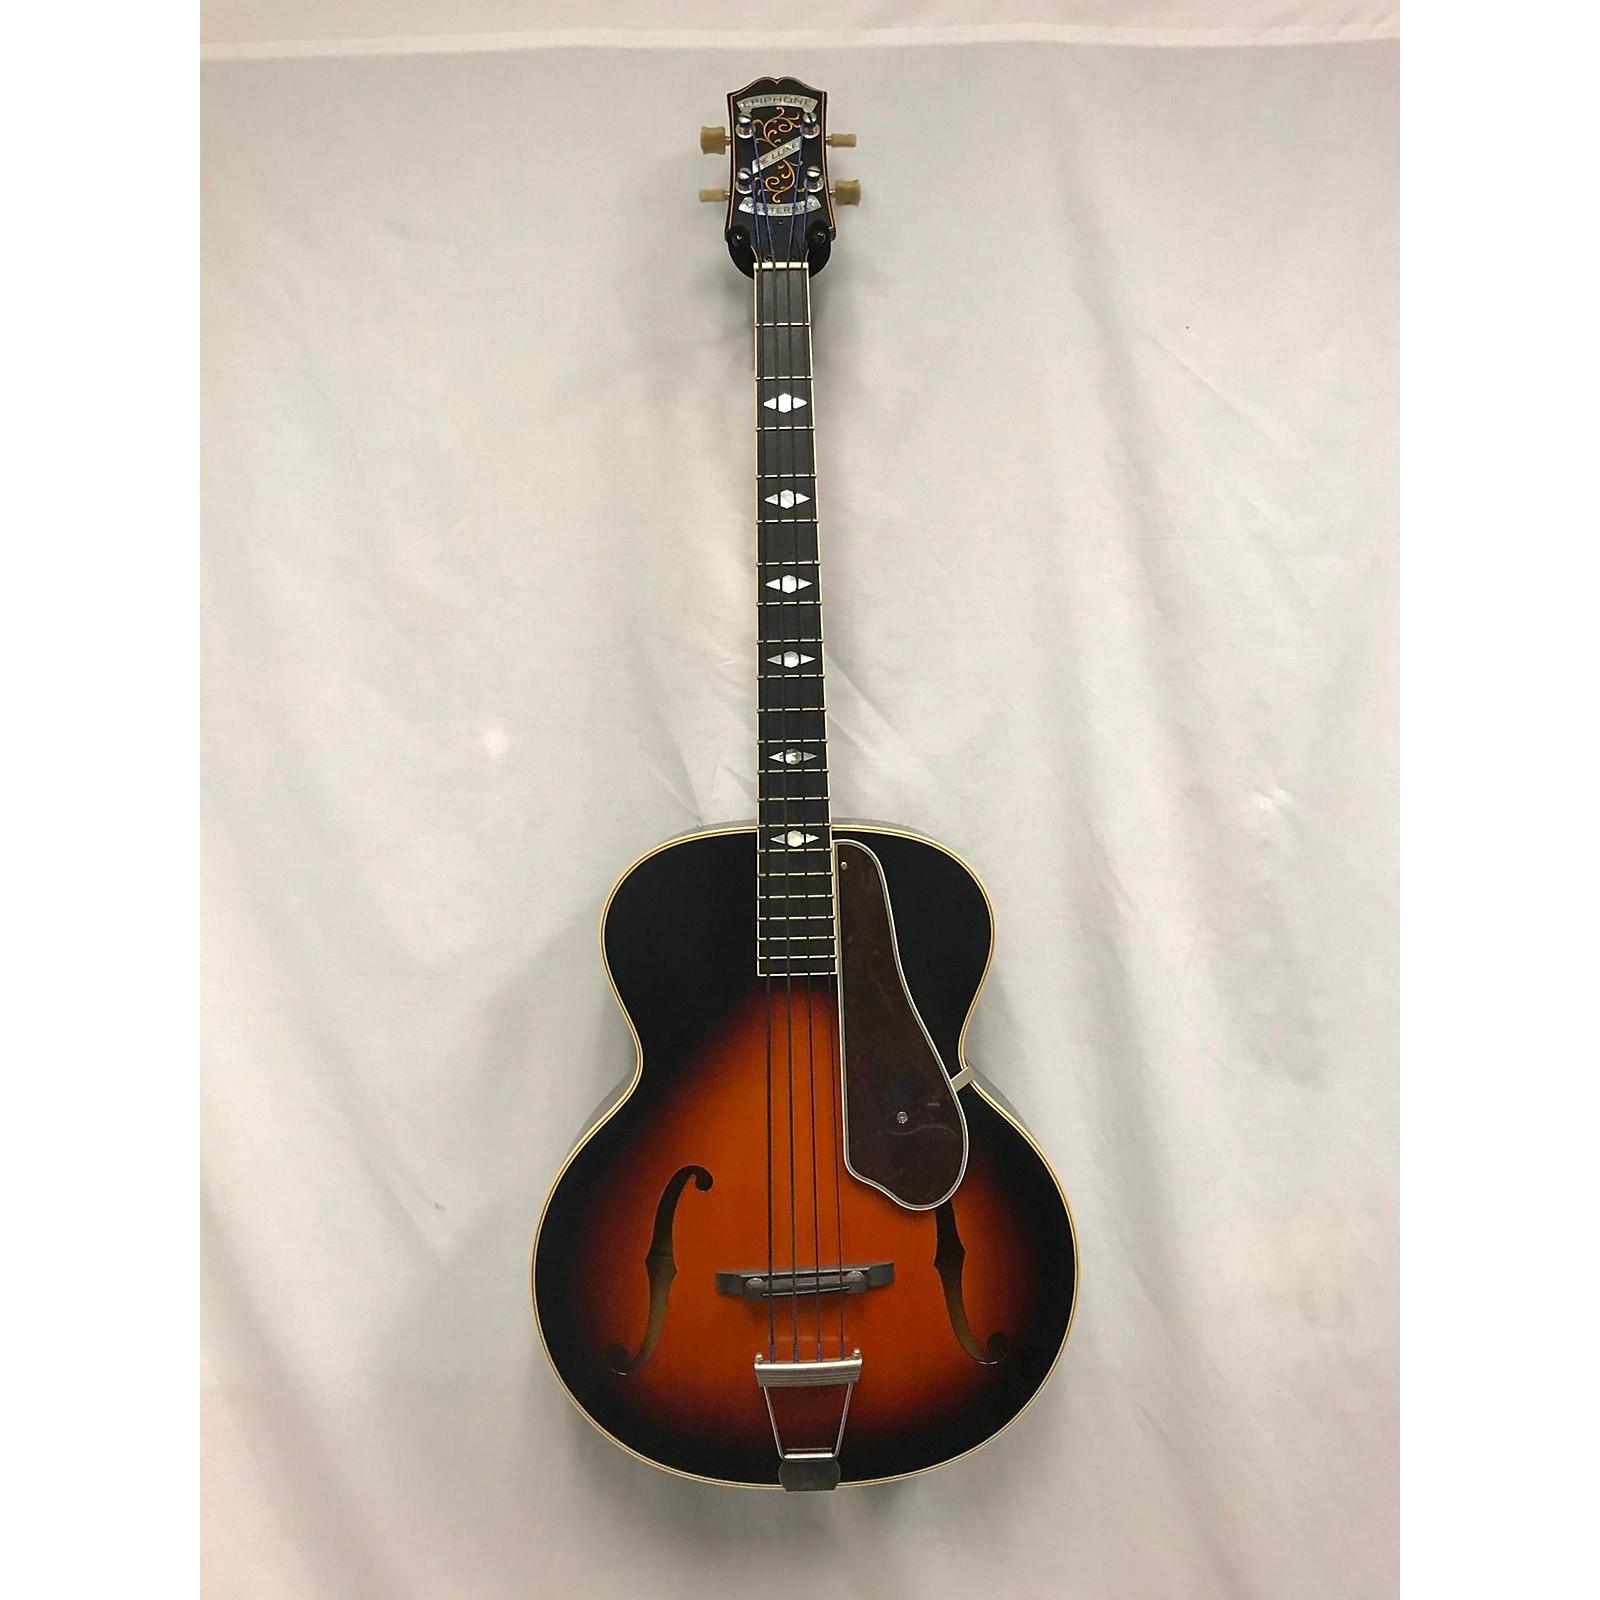 Epiphone DE LUXE Masterbuilt Electric Bass Guitar